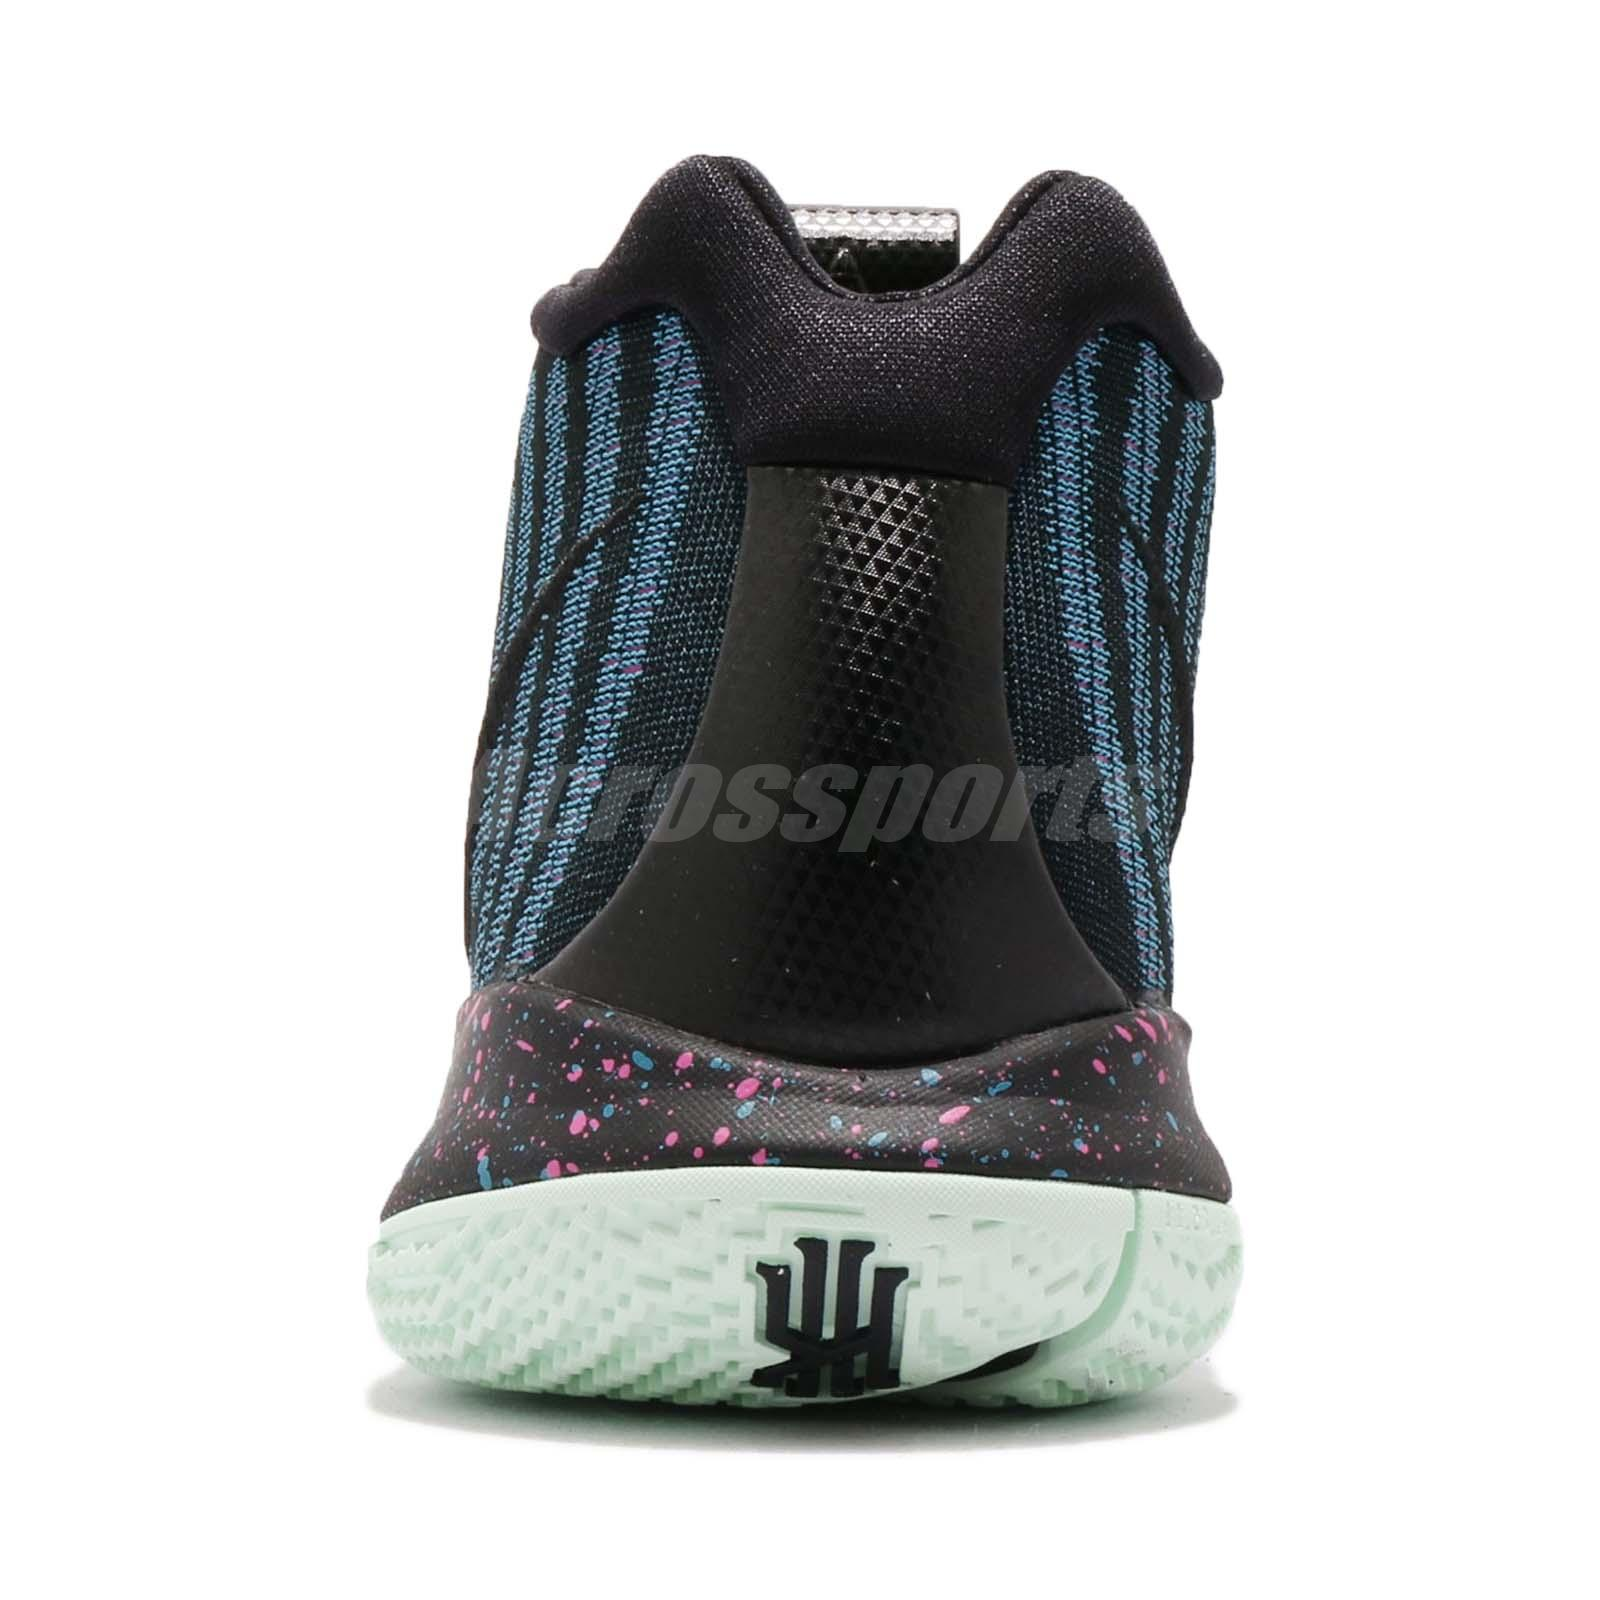 a99ea14b9c6b Nike Kyrie 4 EP 80s Black Laser Fuchsia Irving Men.. in Pakaian ...